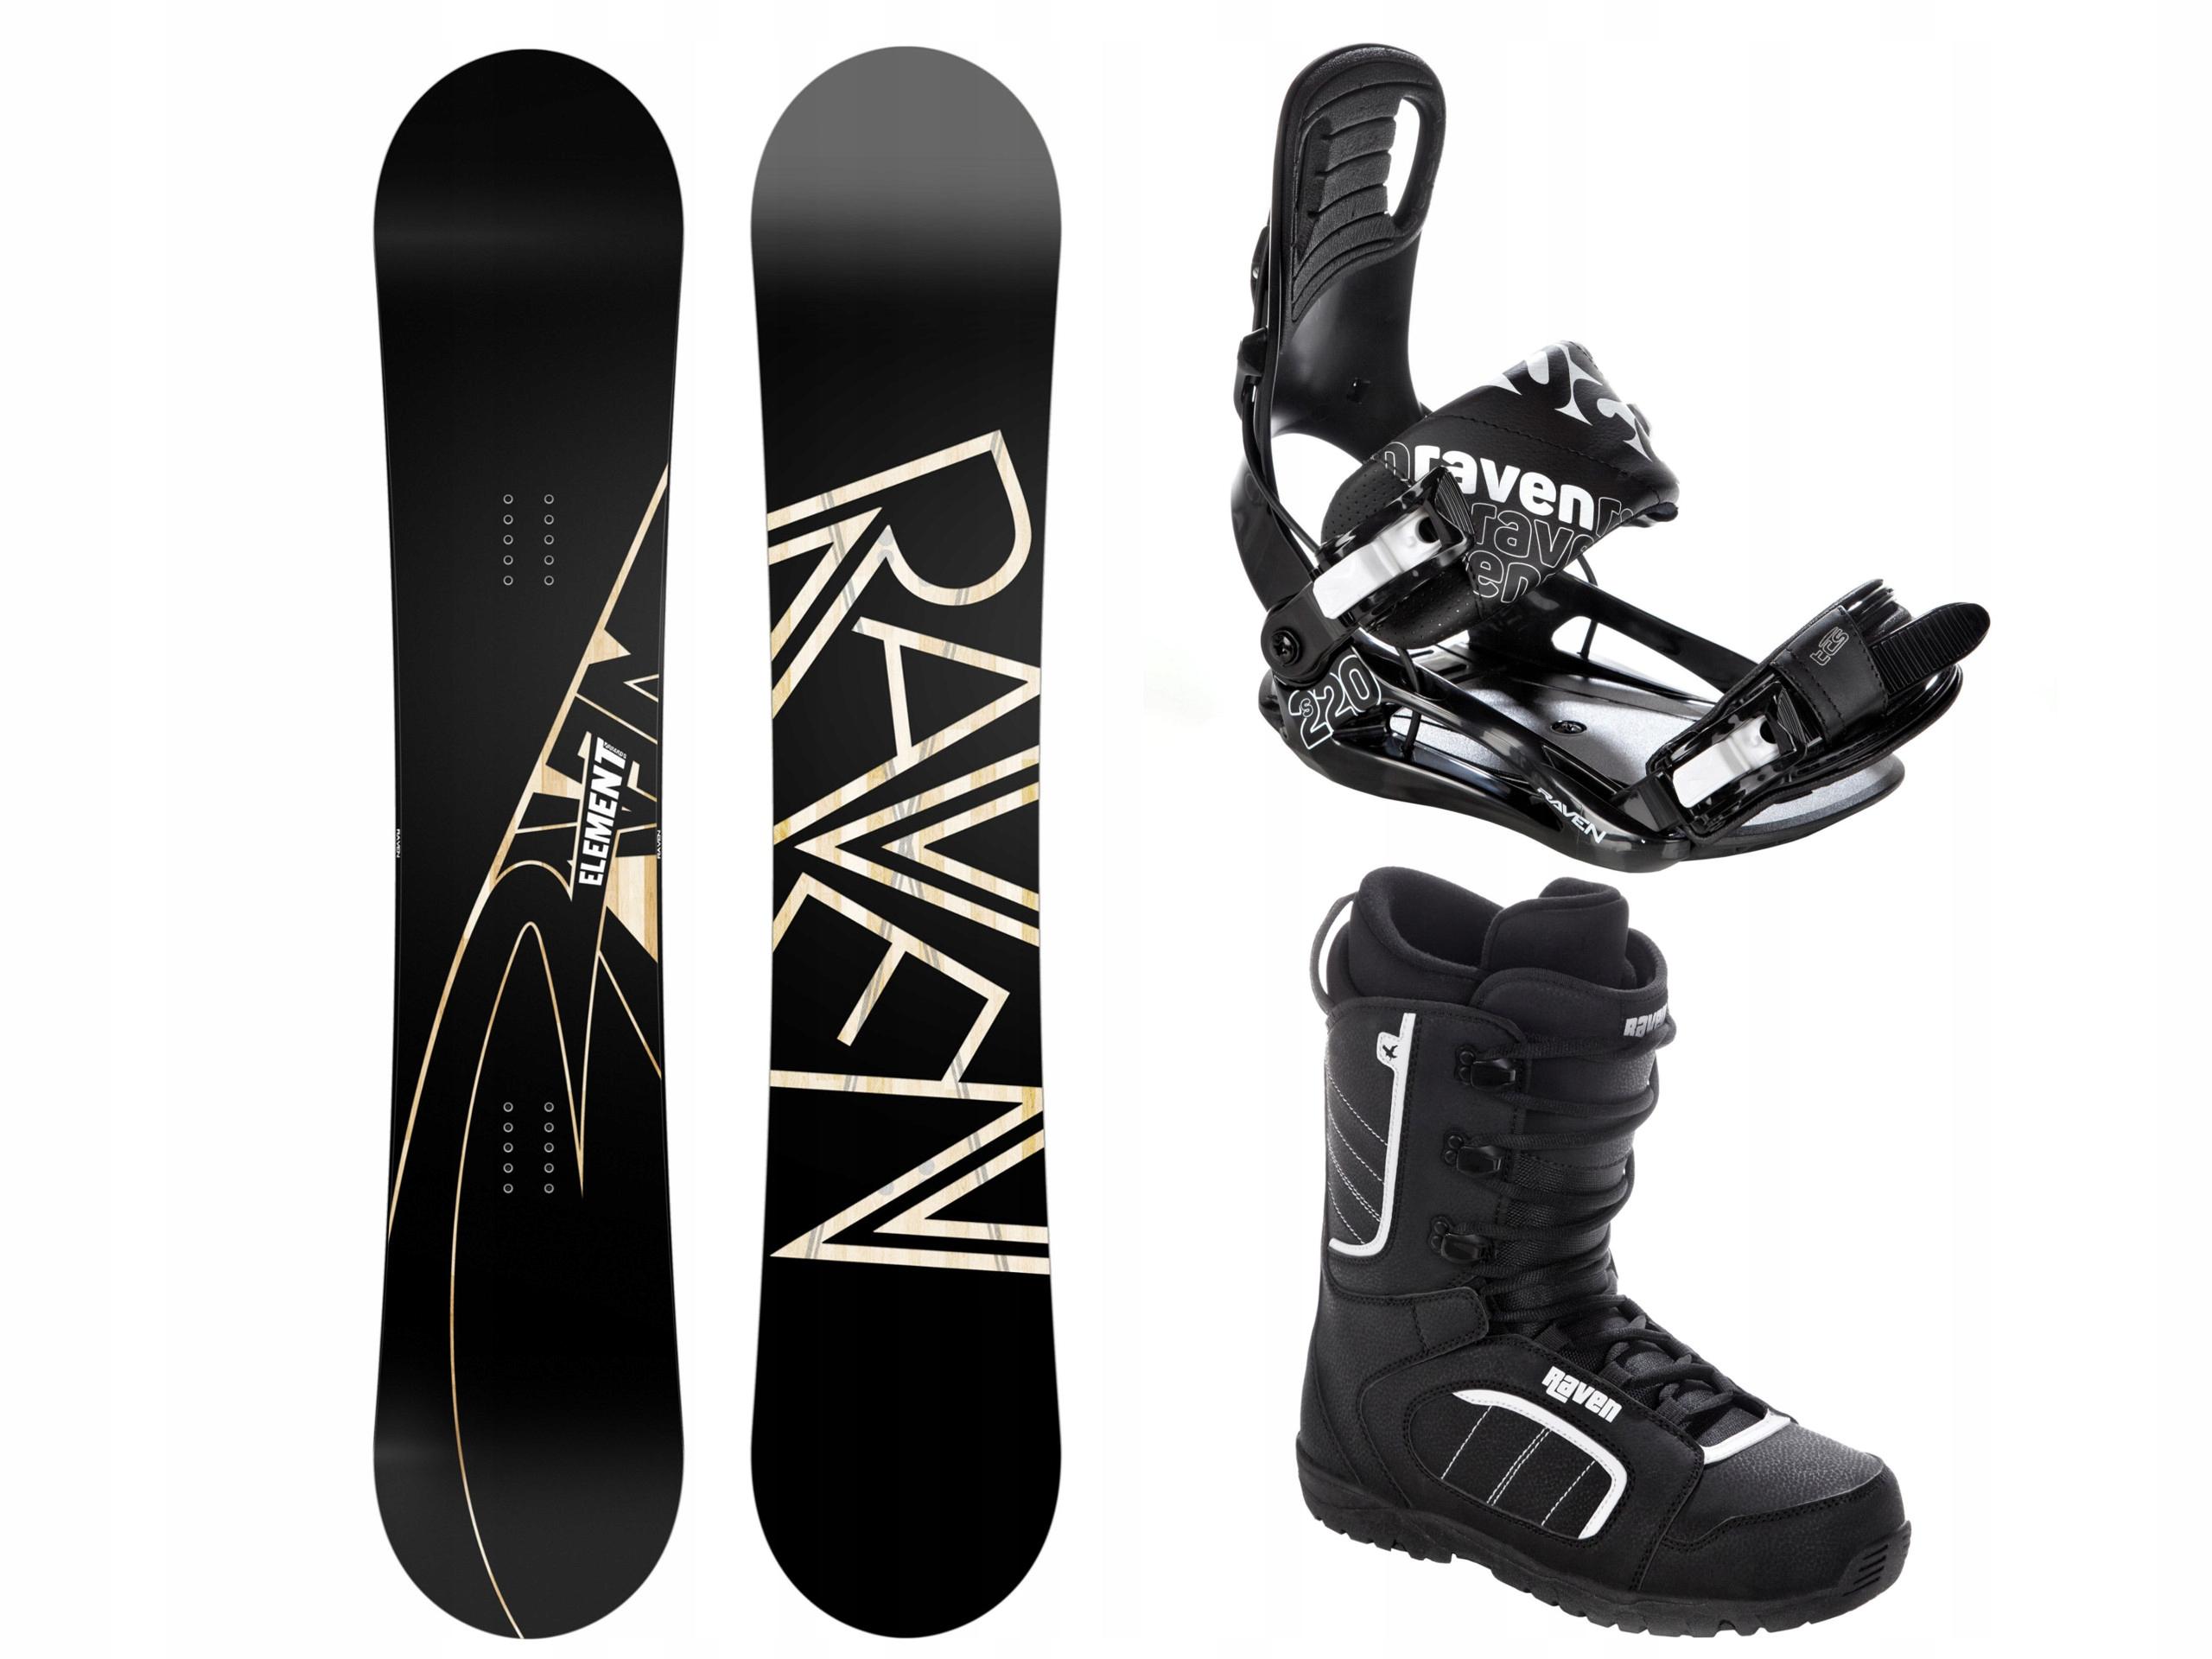 ADIDAS RESPONSE ADV BOOTS BW0996 44 23 SNOWBOARD